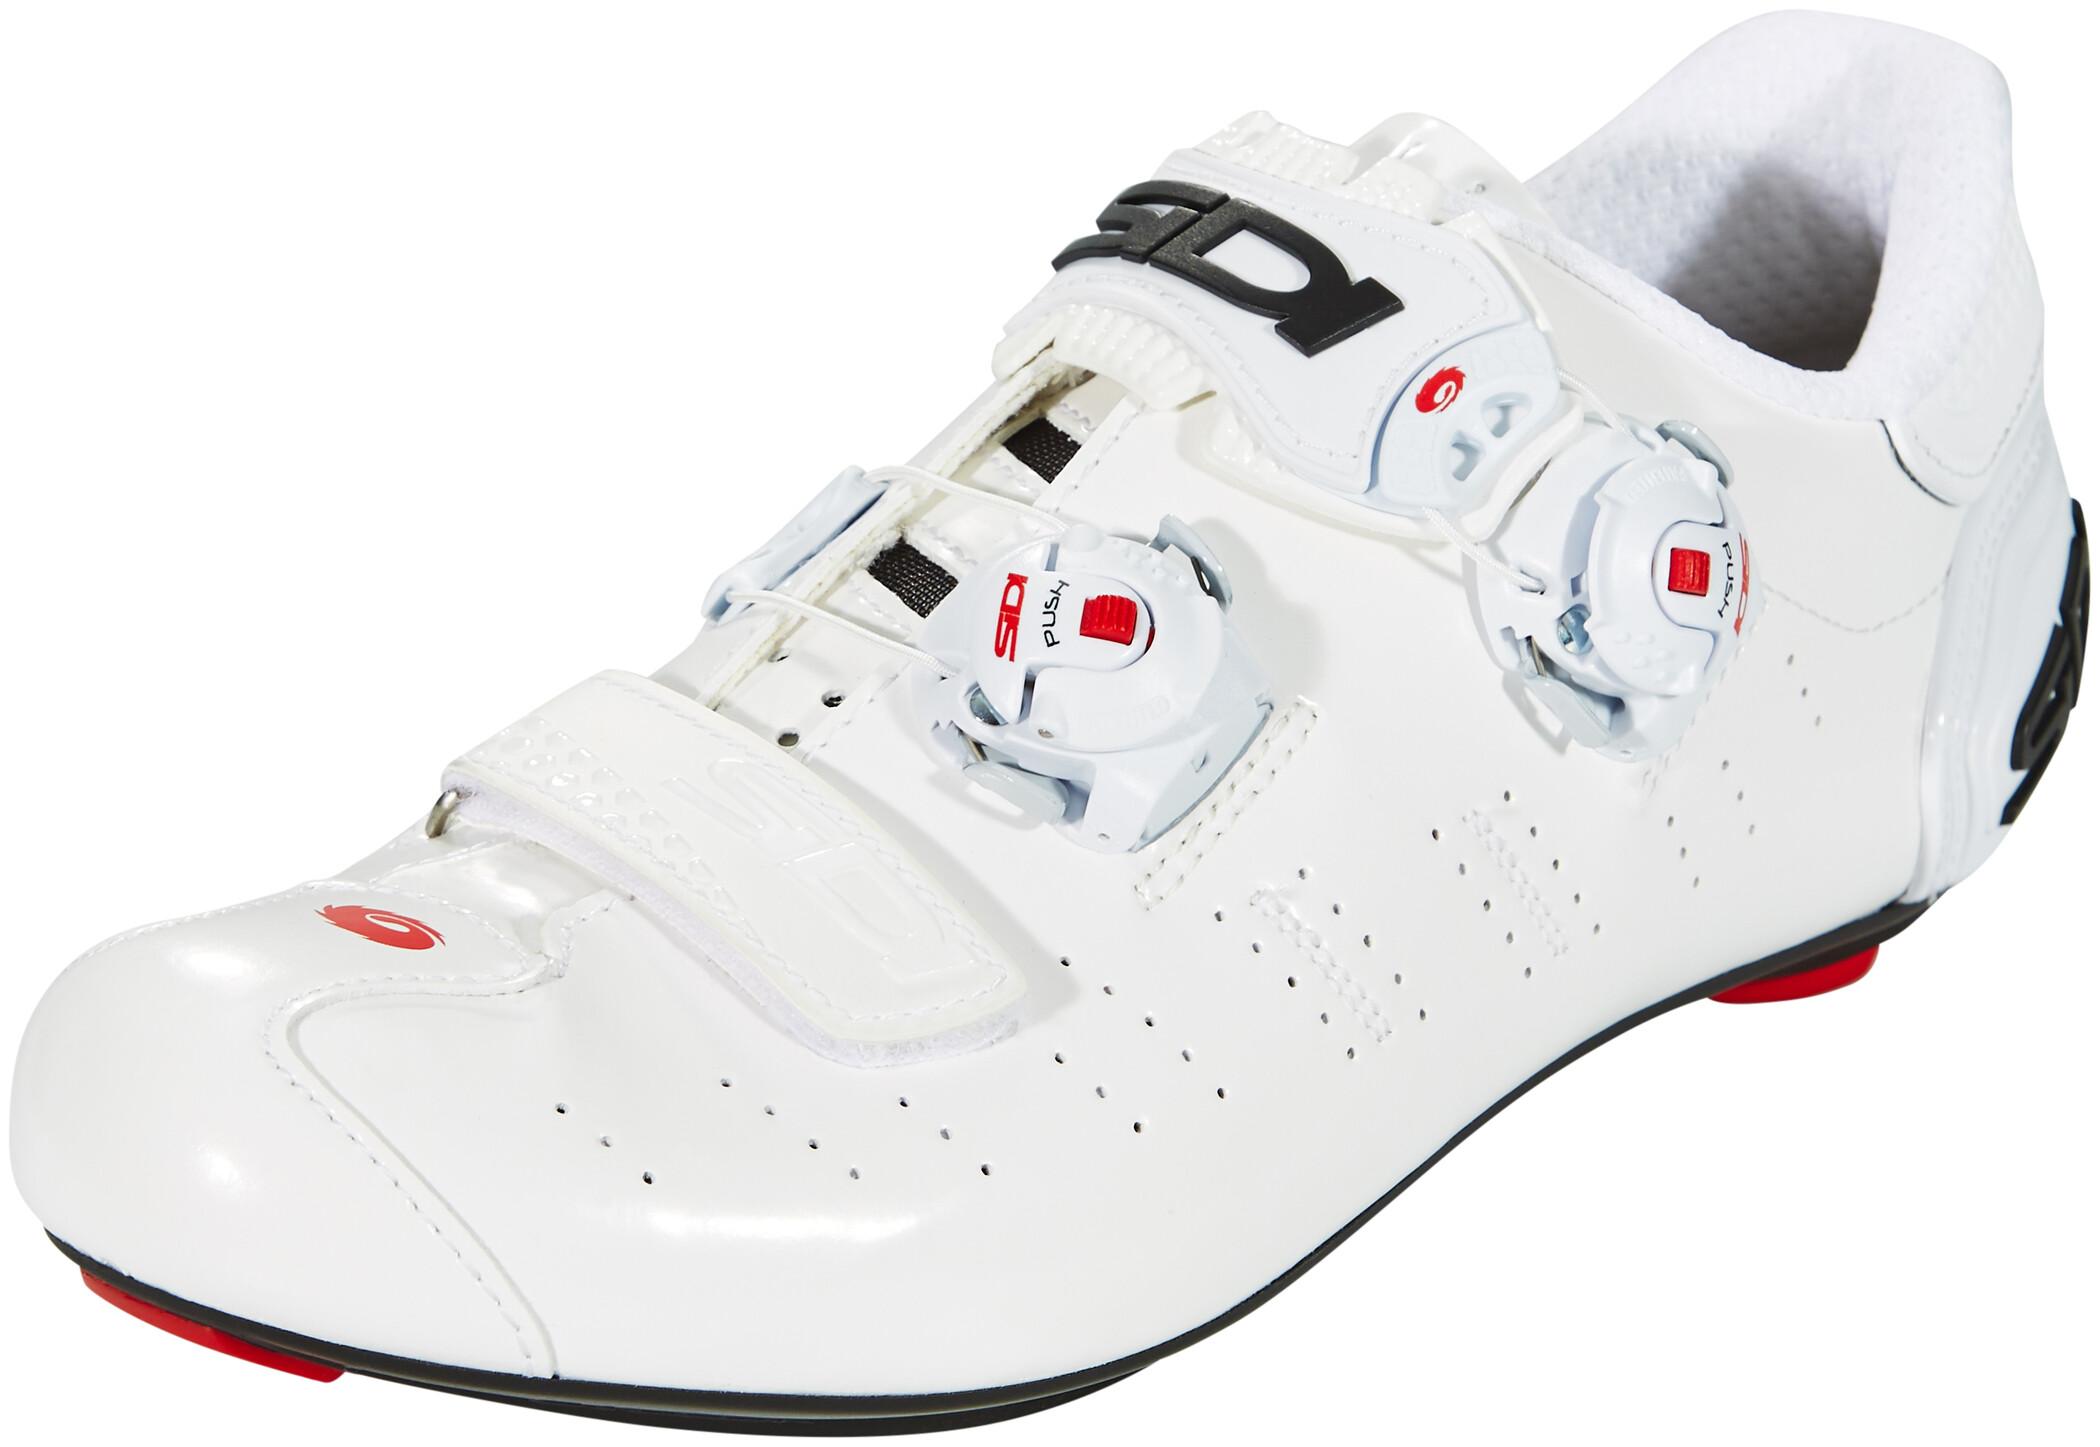 Sidi Ergo 5 Carbon Sko Herrer, white/white (2019)   Shoes and overlays